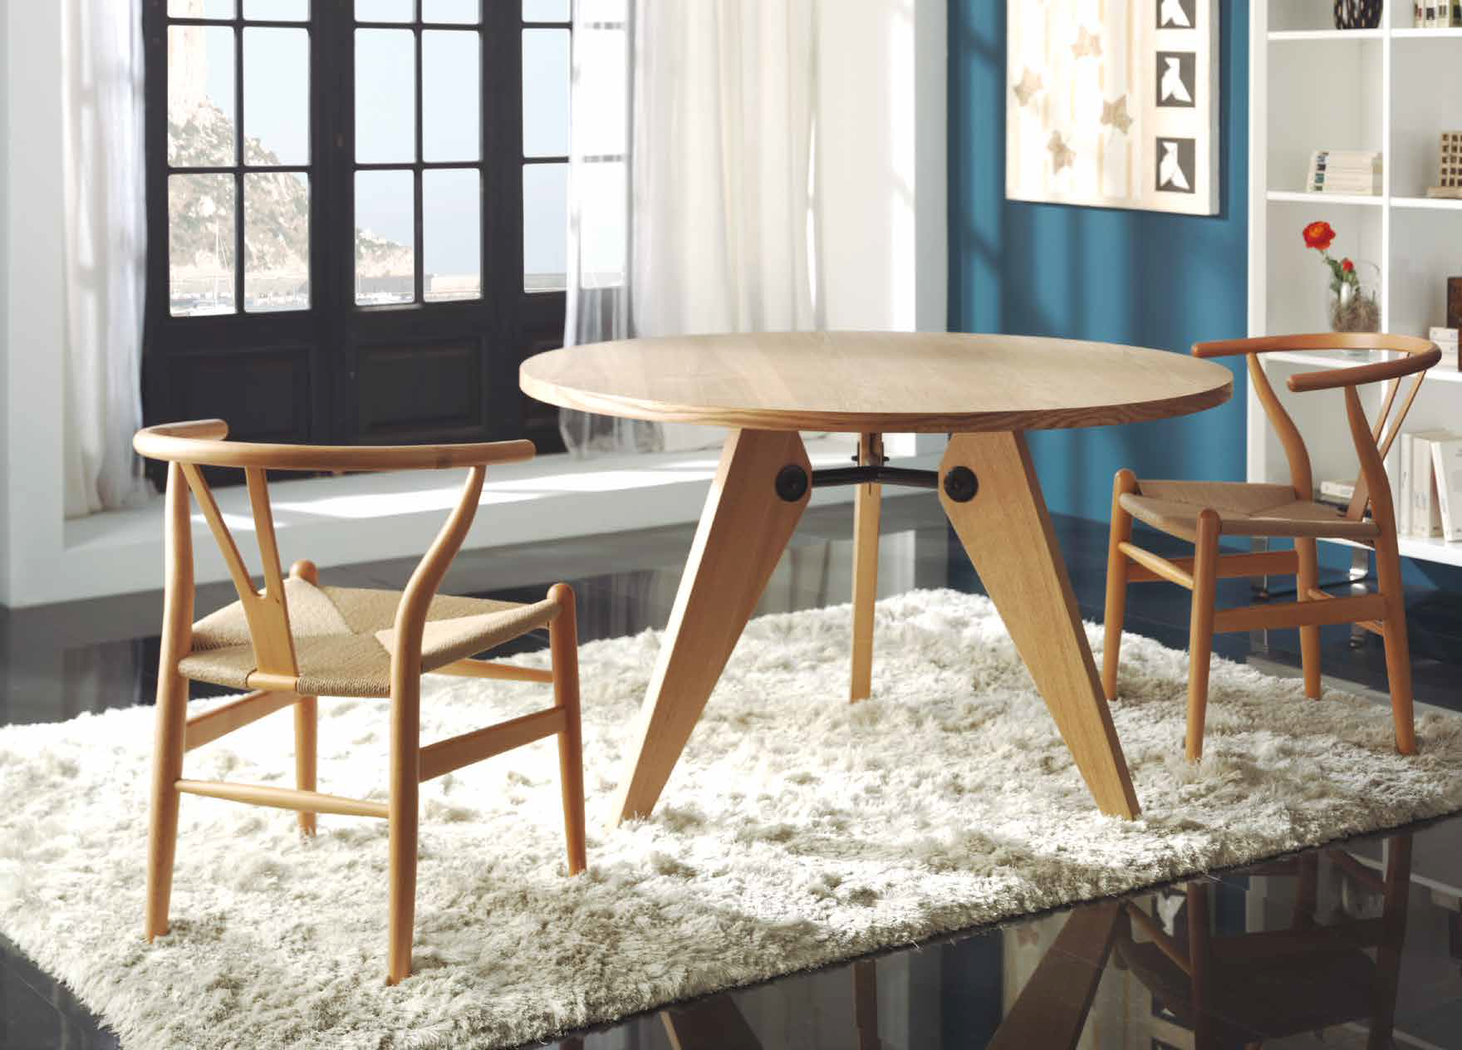 Mesa de comedor redonda 120 cm comedor - Mesas redondas comedor ...